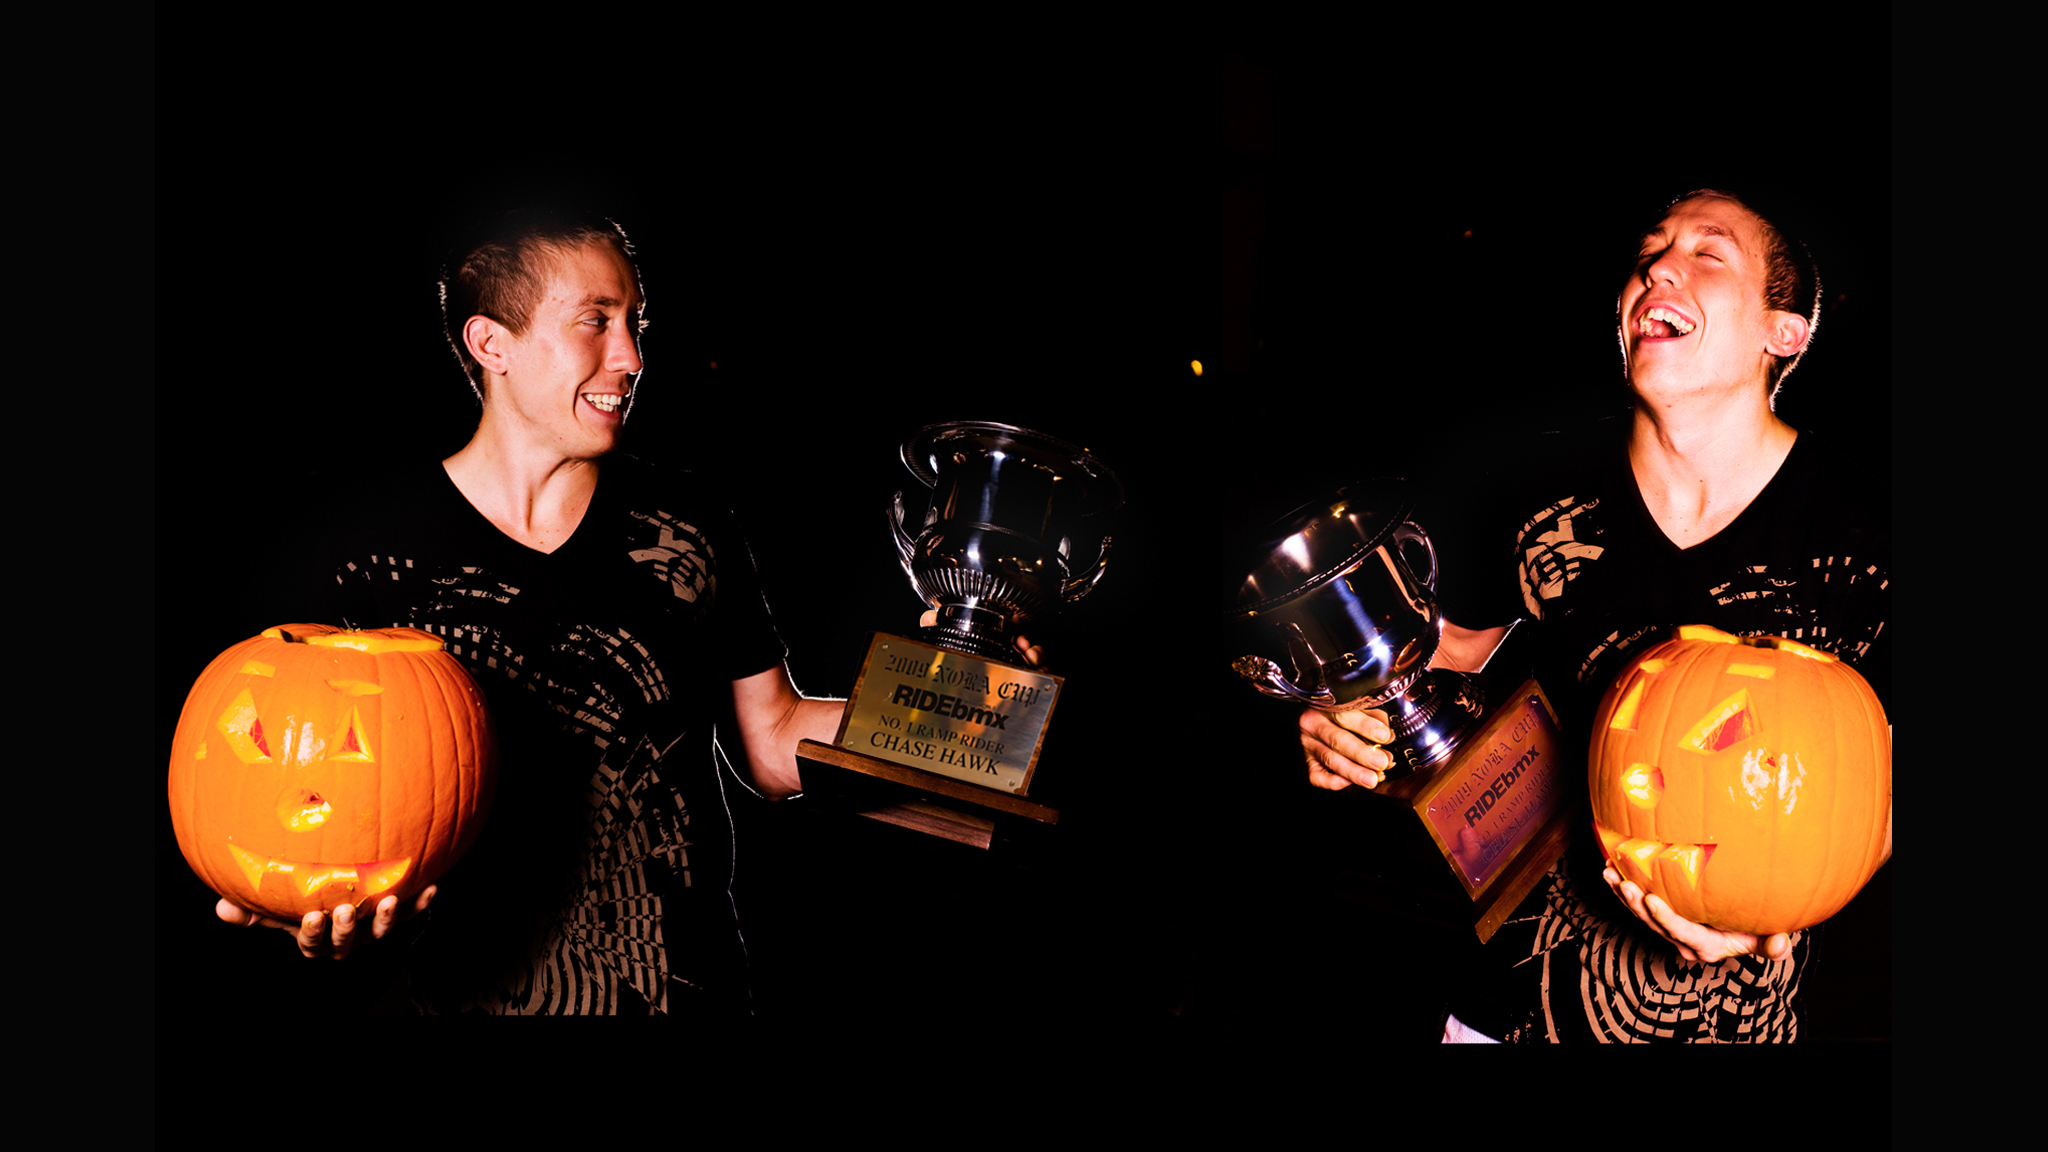 NORA Cup Award, 2009